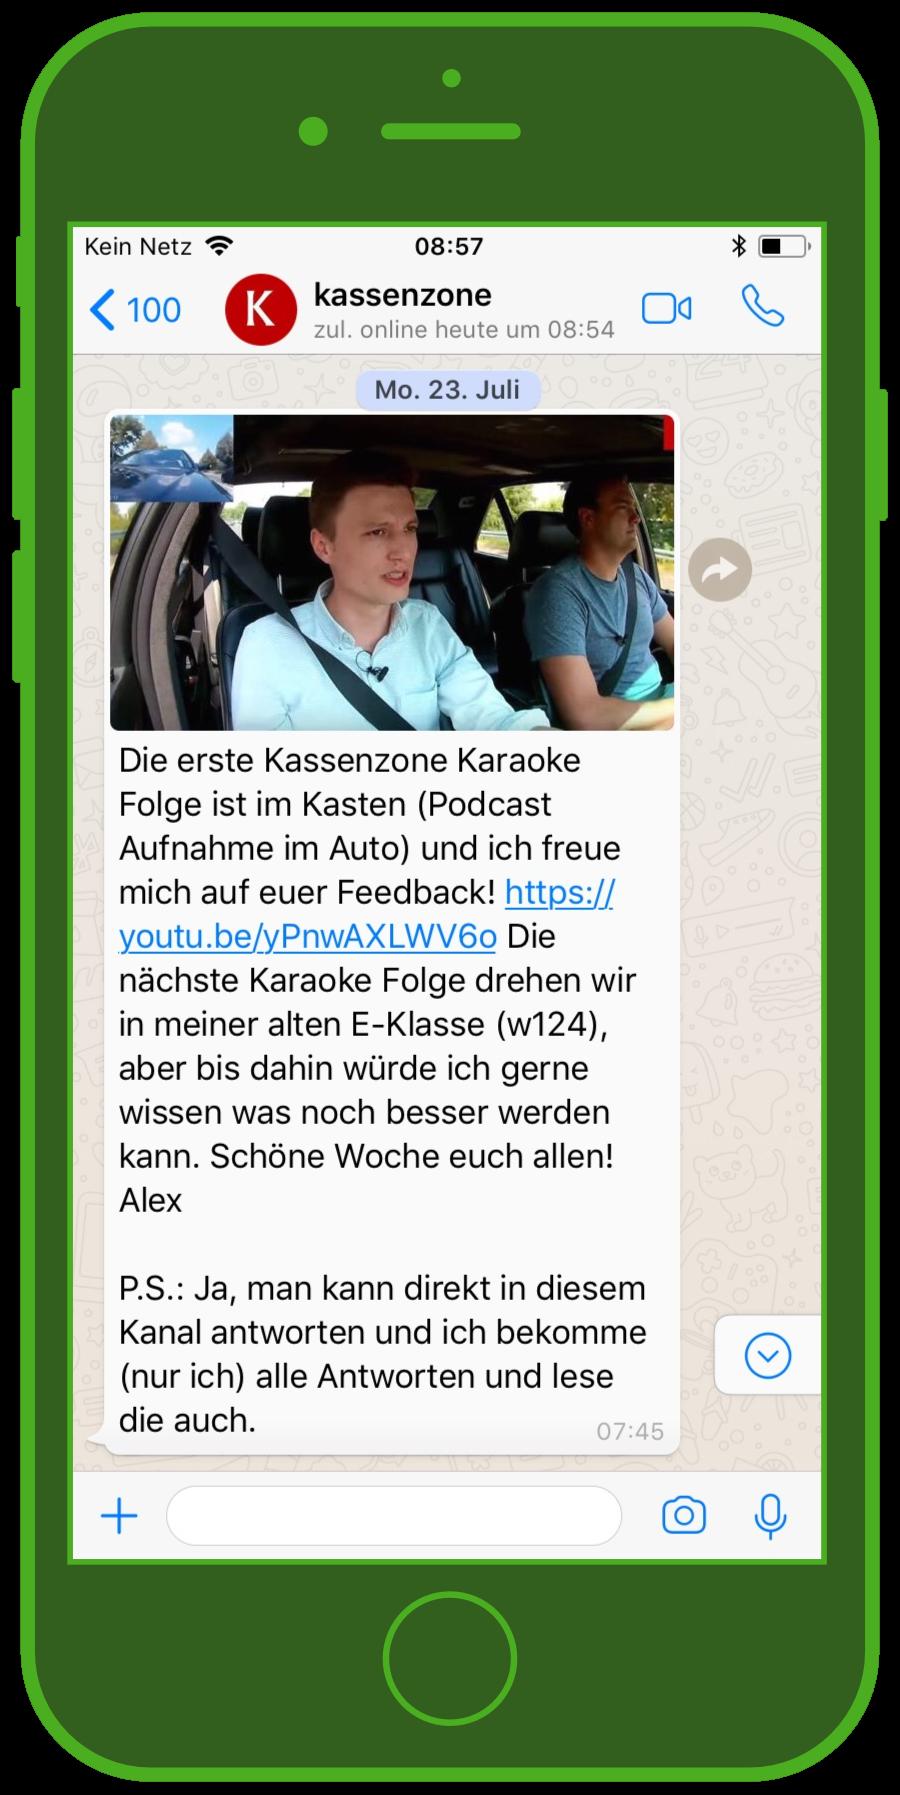 kassenzone-whatsapp-service-kundenbindung